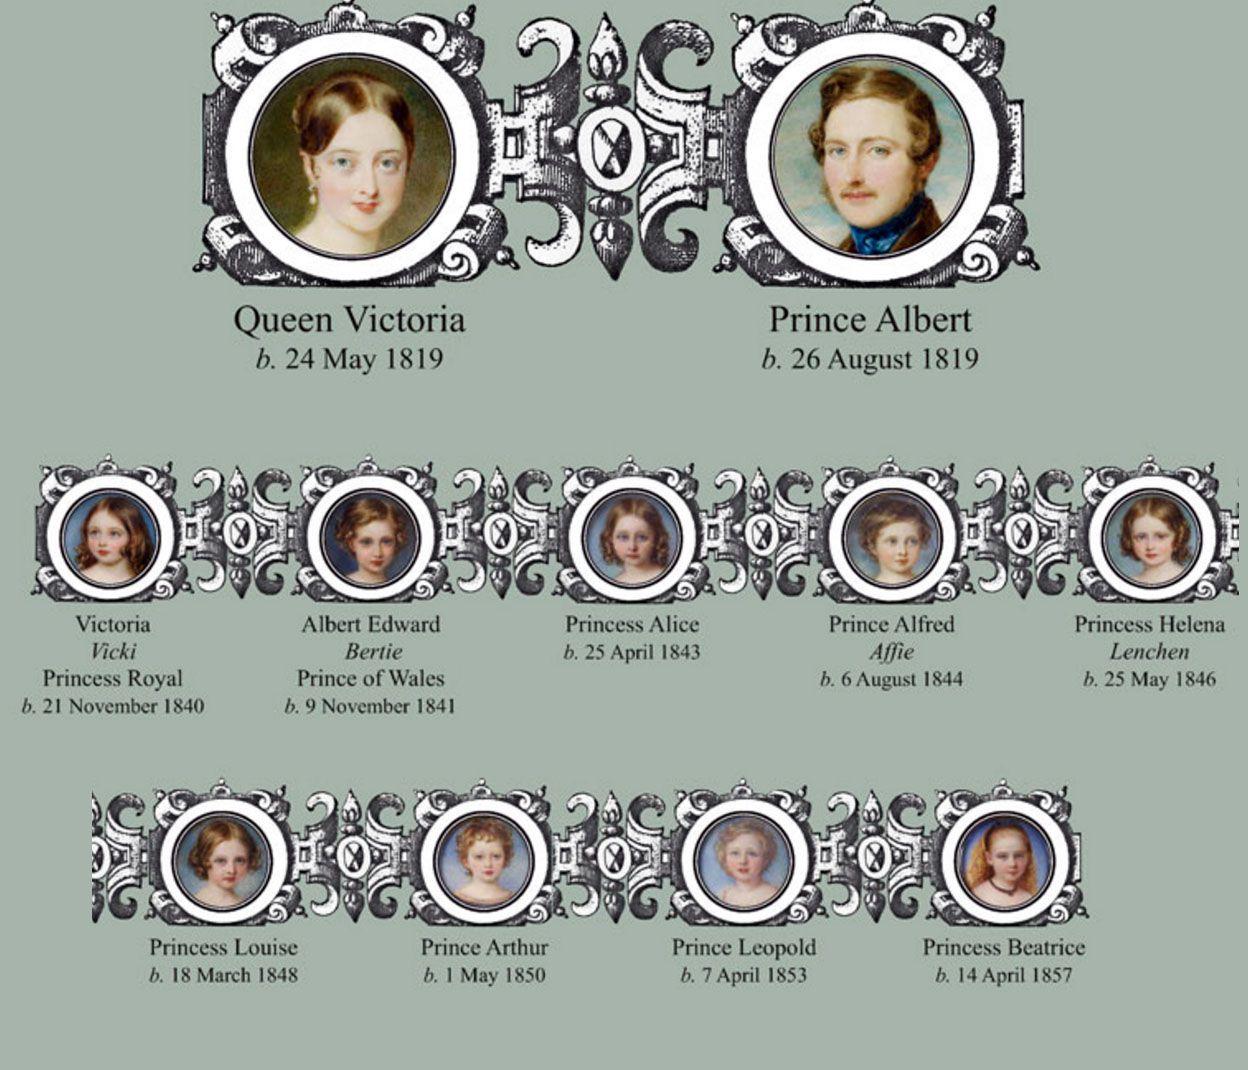 Queen Victoria & Prince Albert family tree Their children